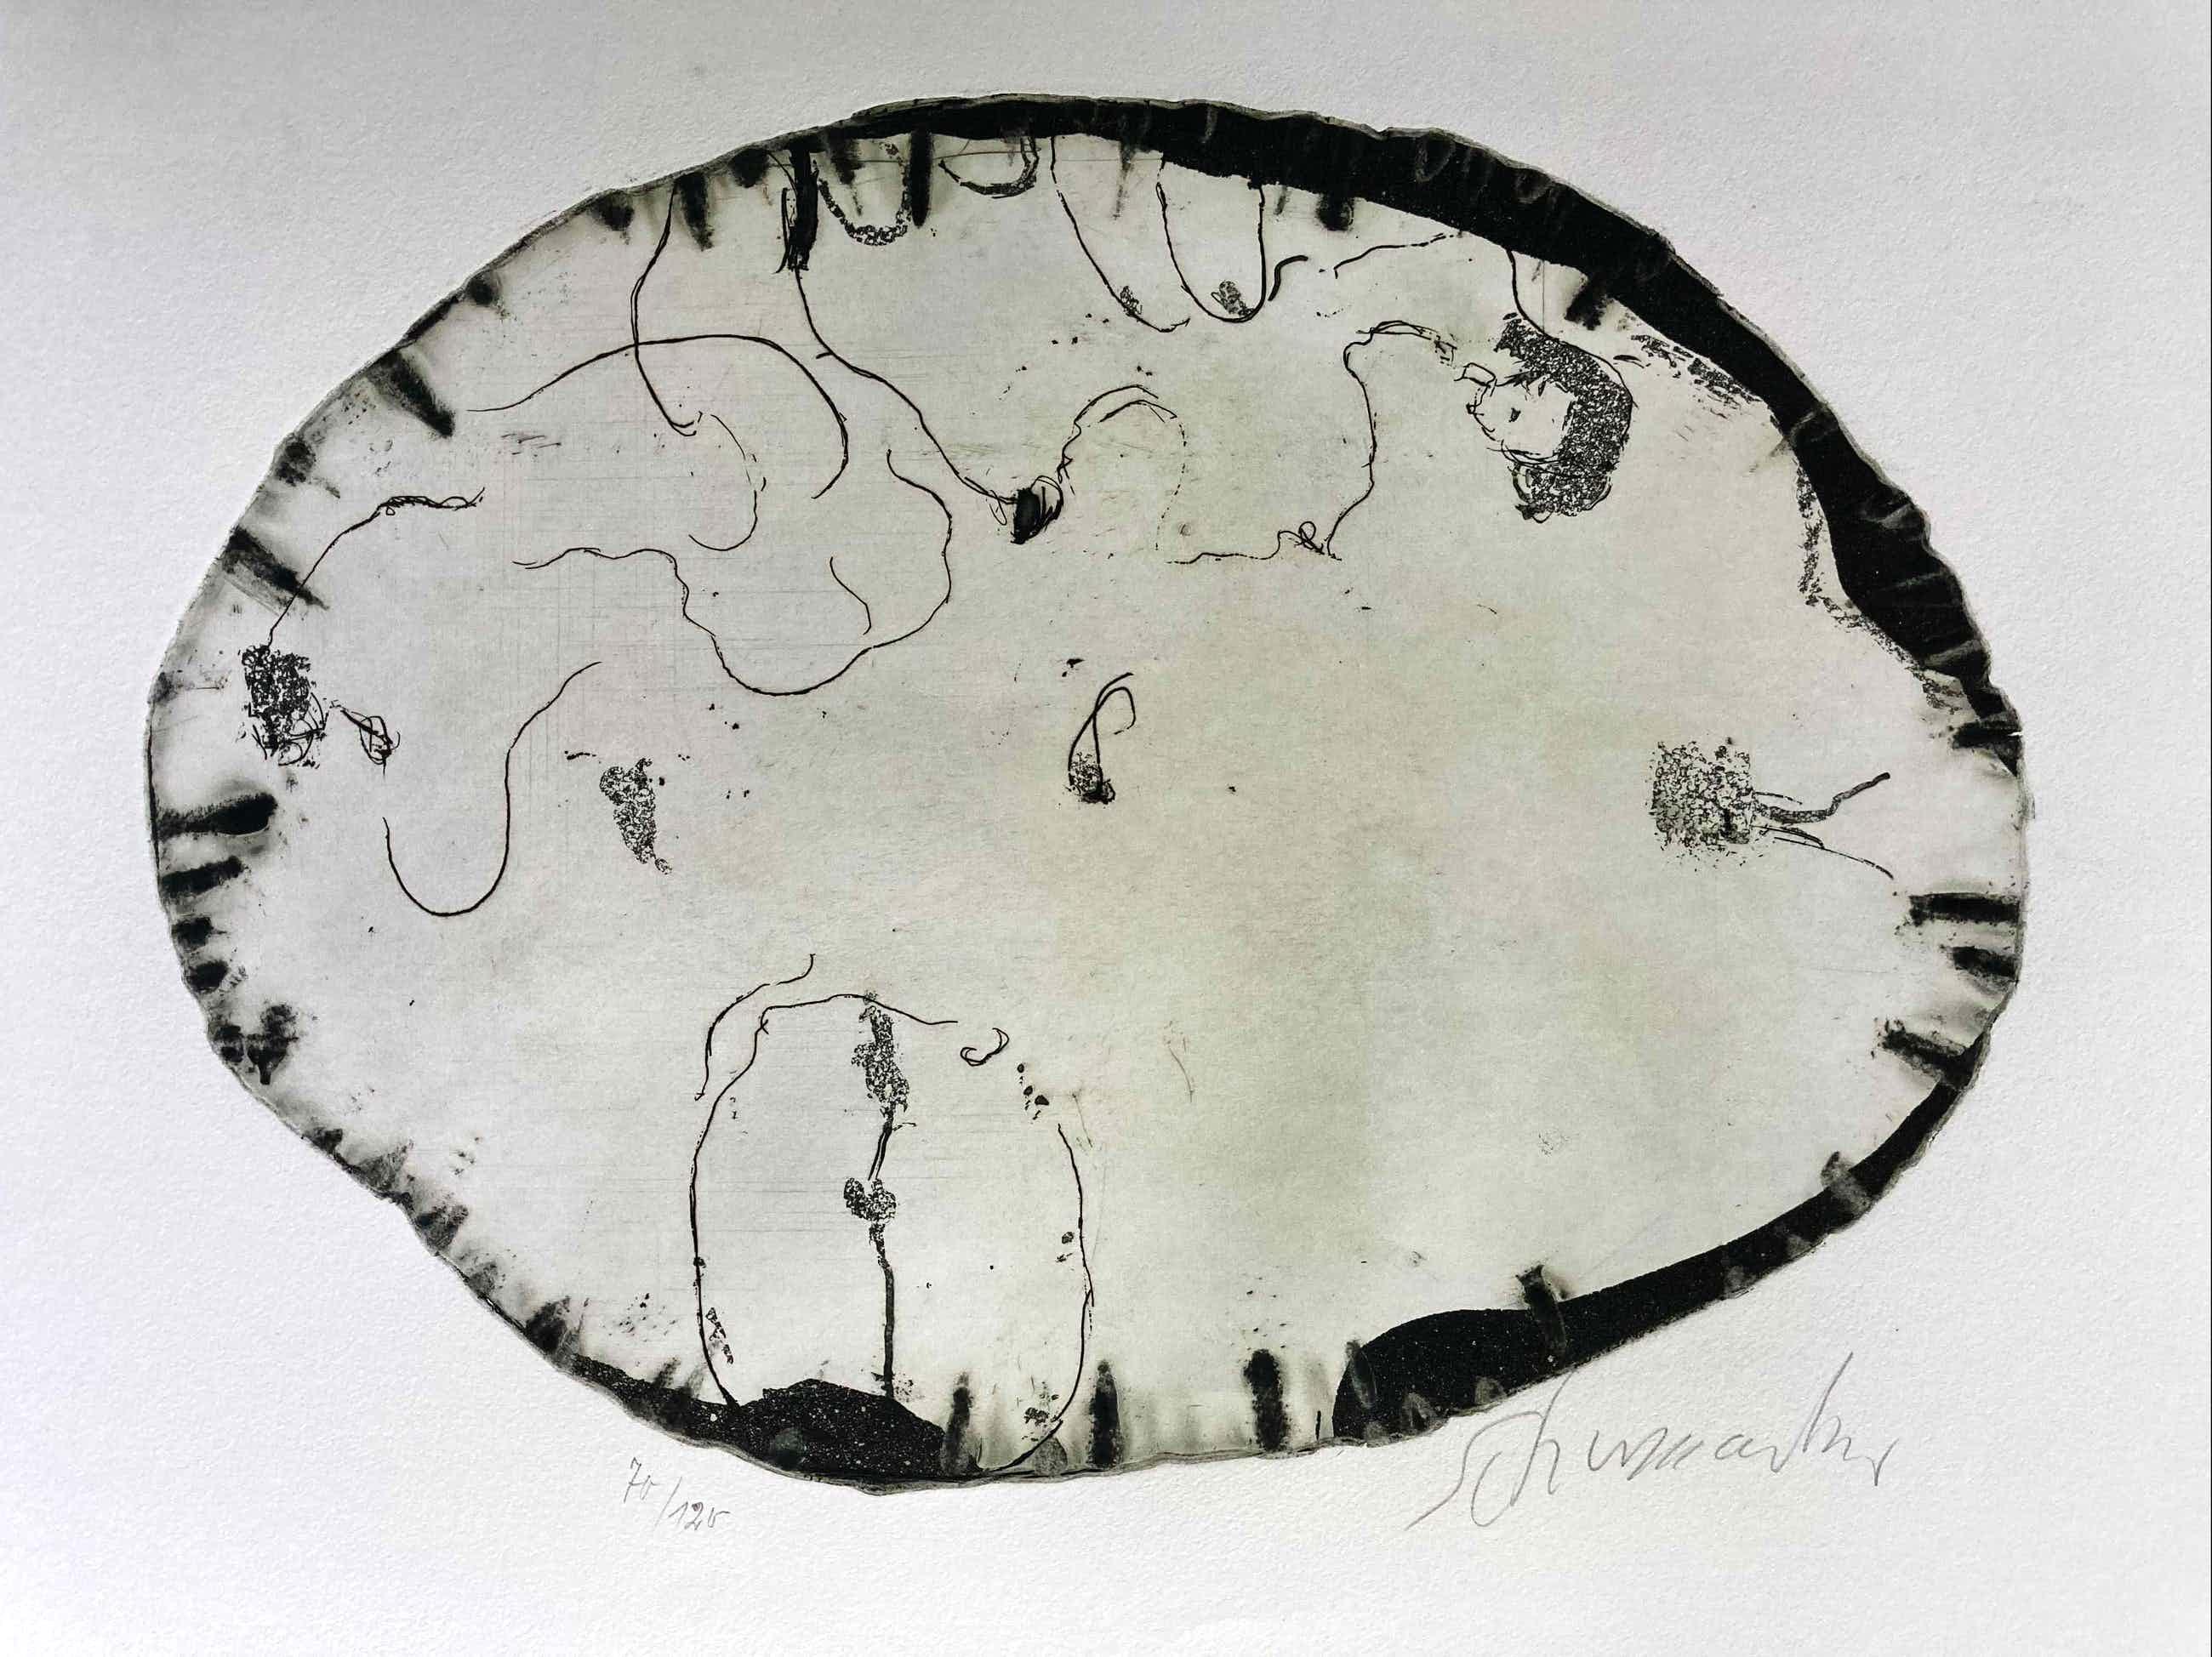 Emil Schumacher - Motiv 7/1967, signiert, nummeriert kopen? Bied vanaf 320!